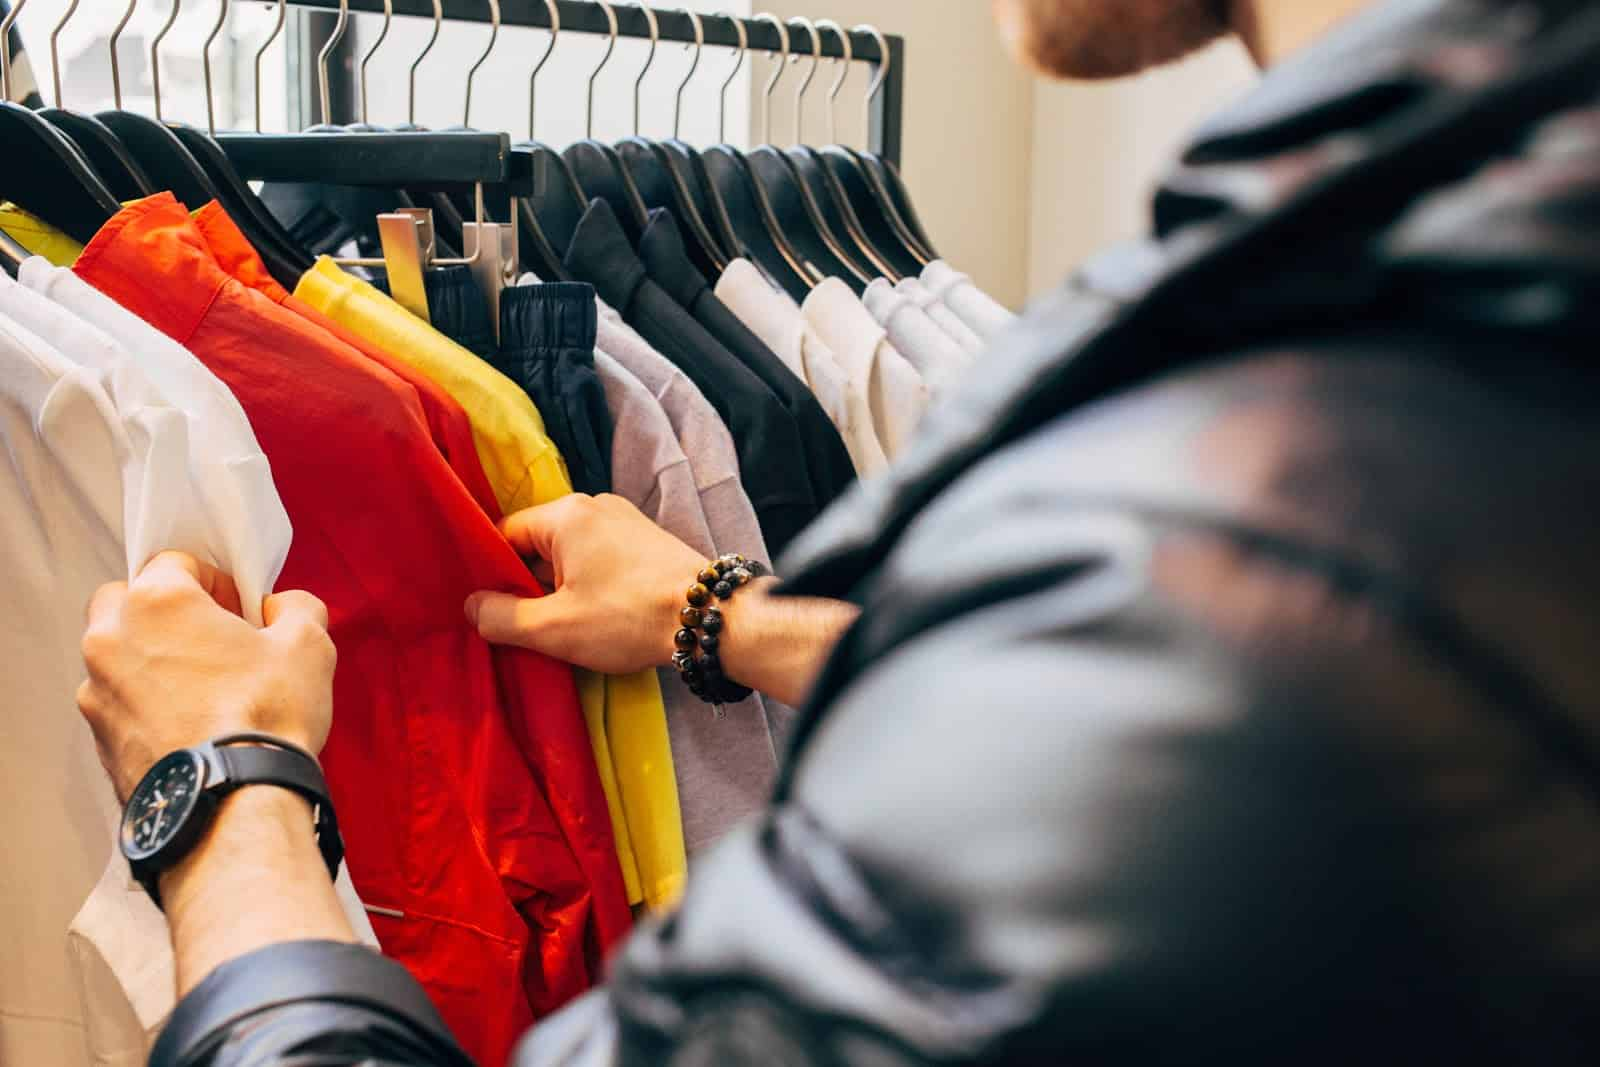 Fun jobs that pay well: Personal shopper